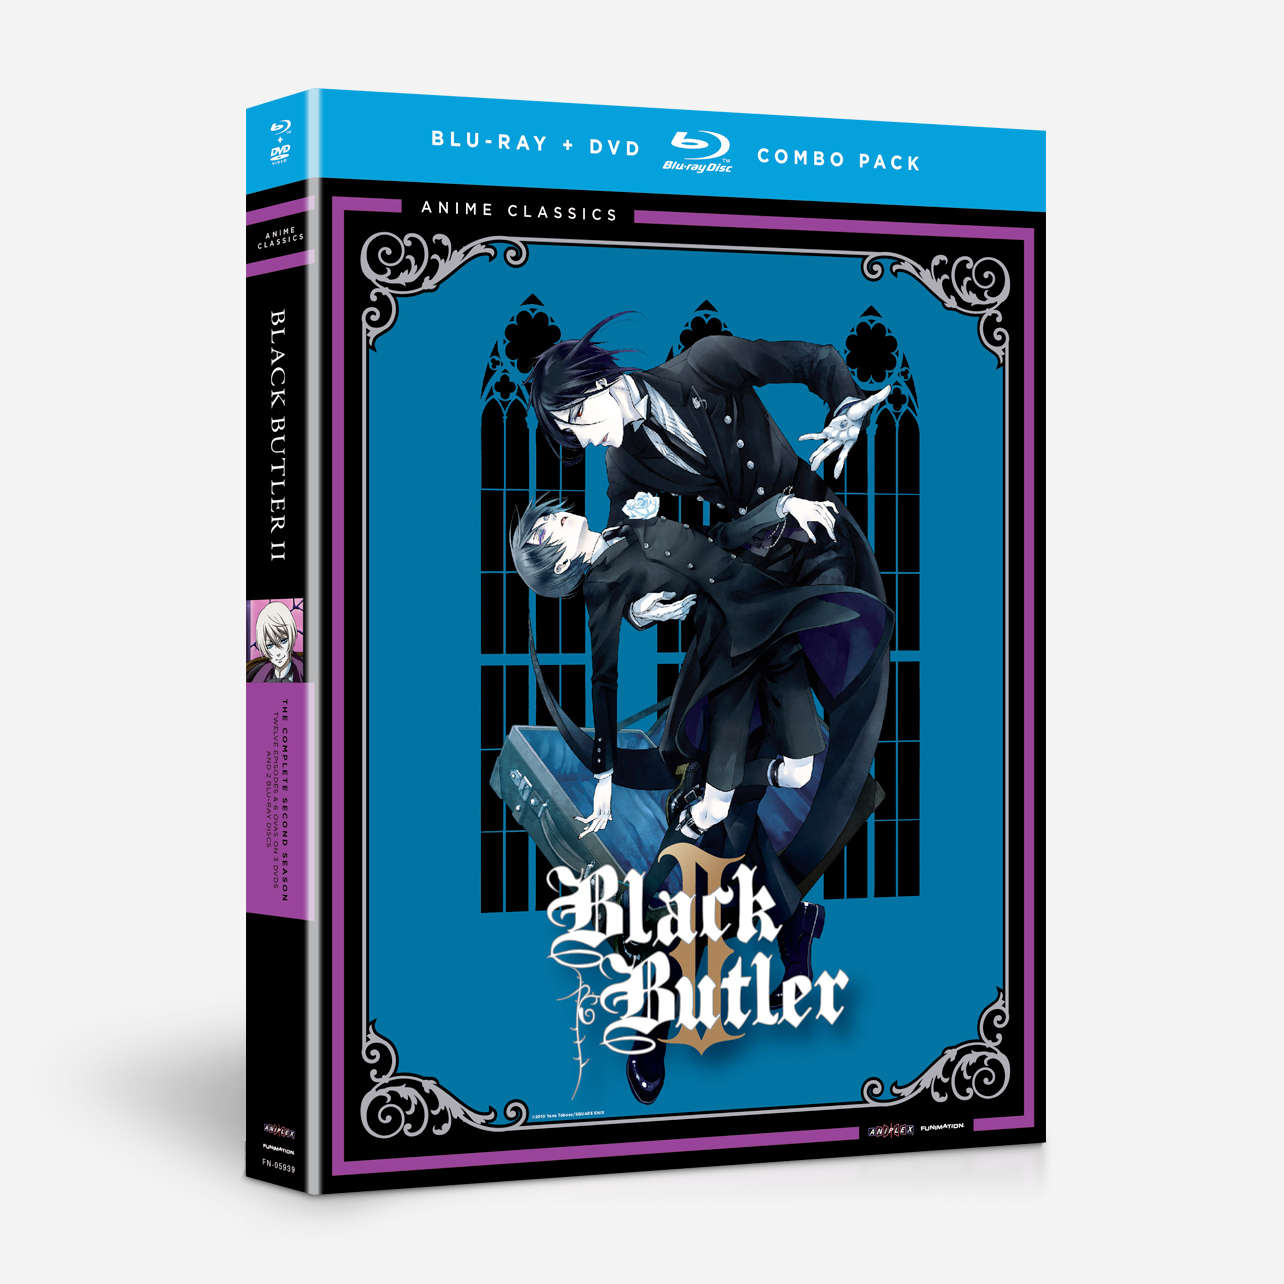 Black butler season 3 release date in Perth